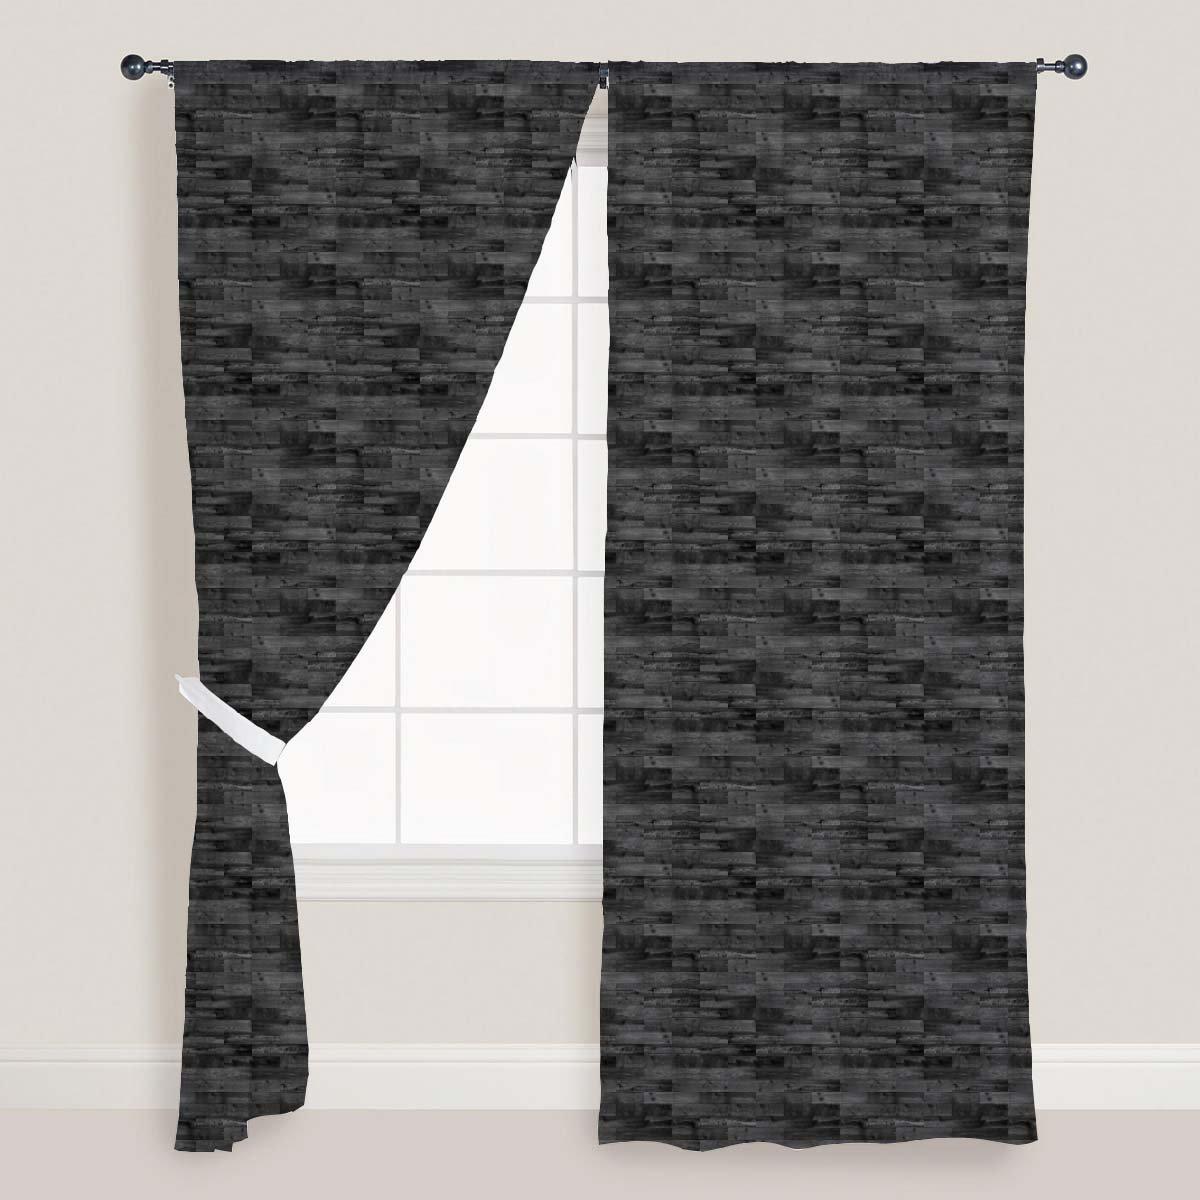 AZ Dark Parquet Door & Window Curtain Satin 4feet x 9feet; SET OF 3 PCS